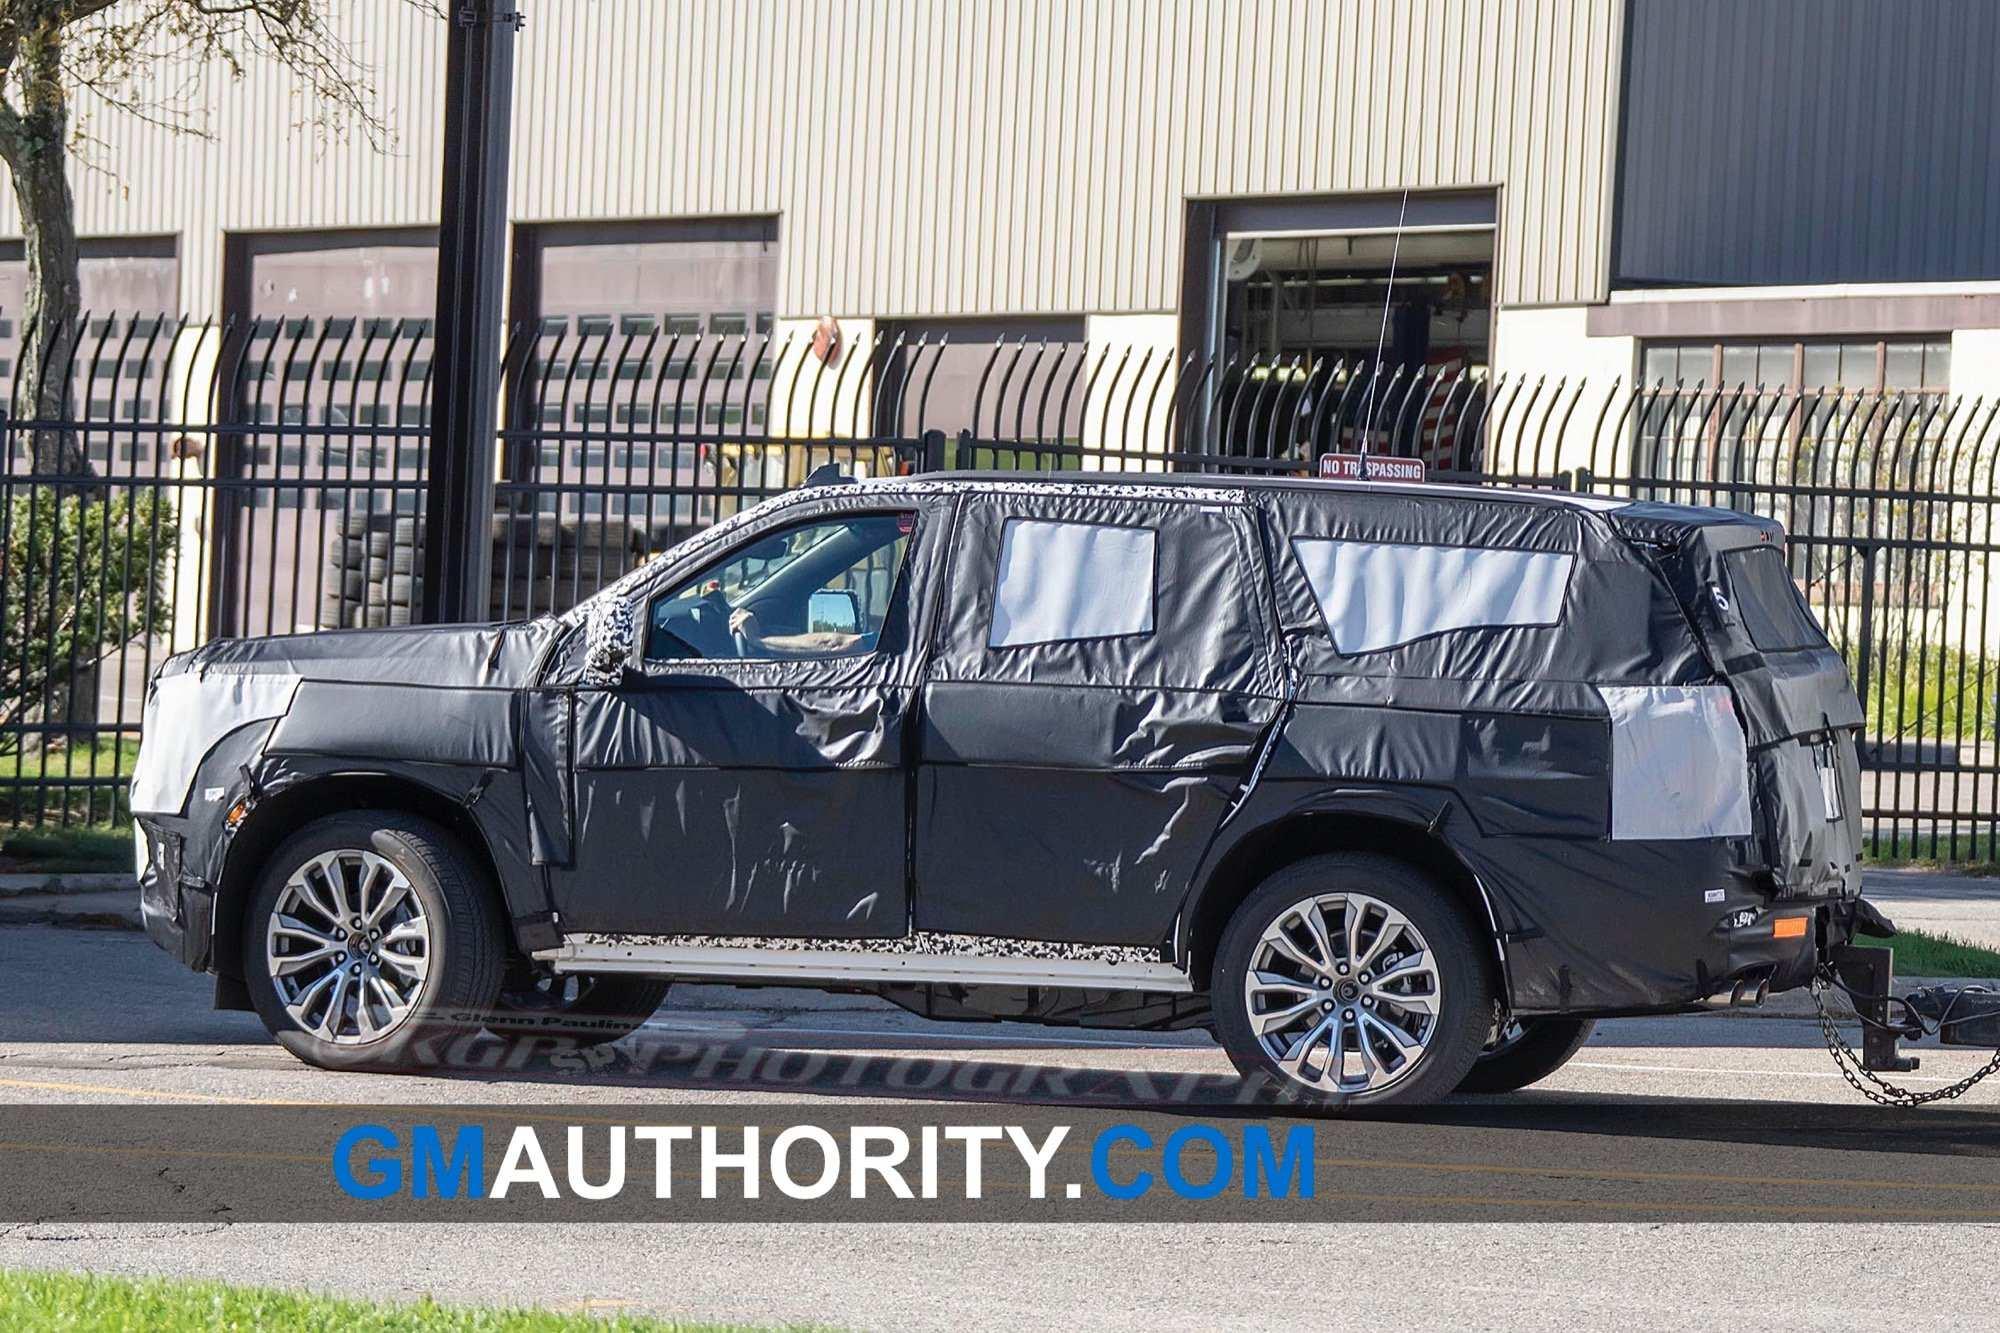 37 All New 2020 Gmc Yukon Detroit Auto Show First Drive by 2020 Gmc Yukon Detroit Auto Show